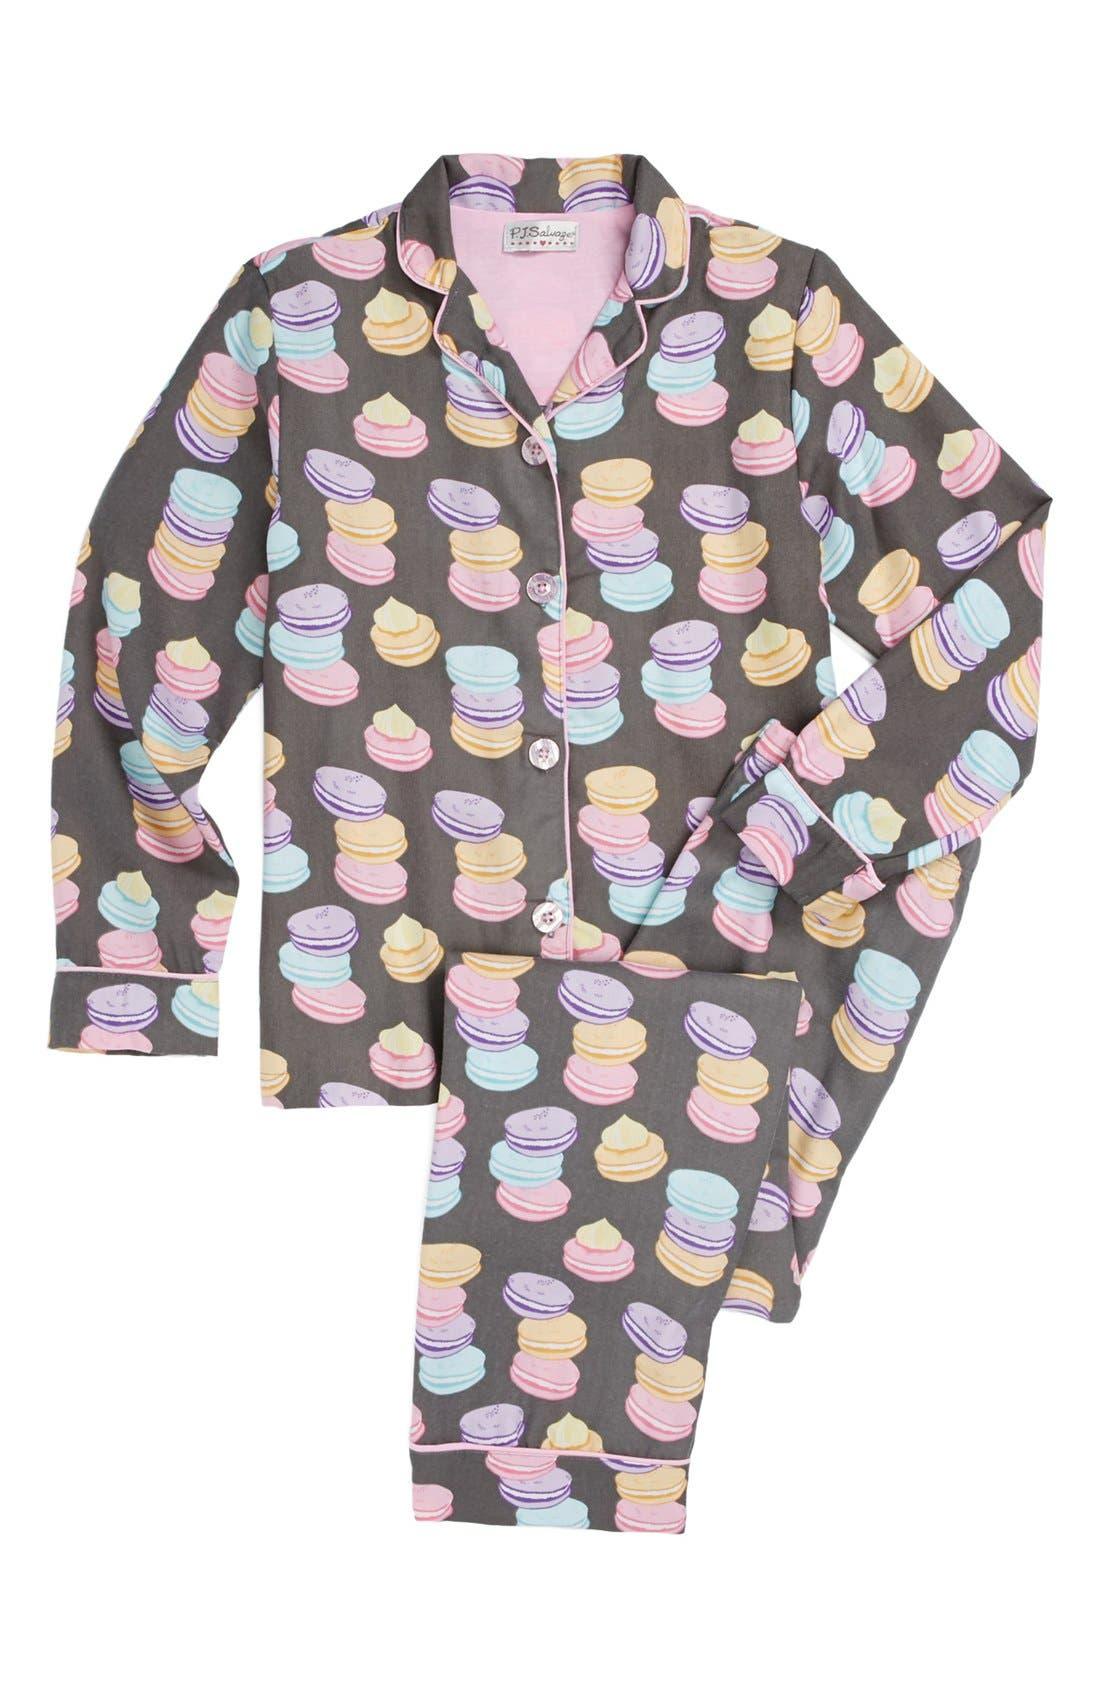 'Macaroon Madness' Two-Piece Pajamas,                             Main thumbnail 1, color,                             020